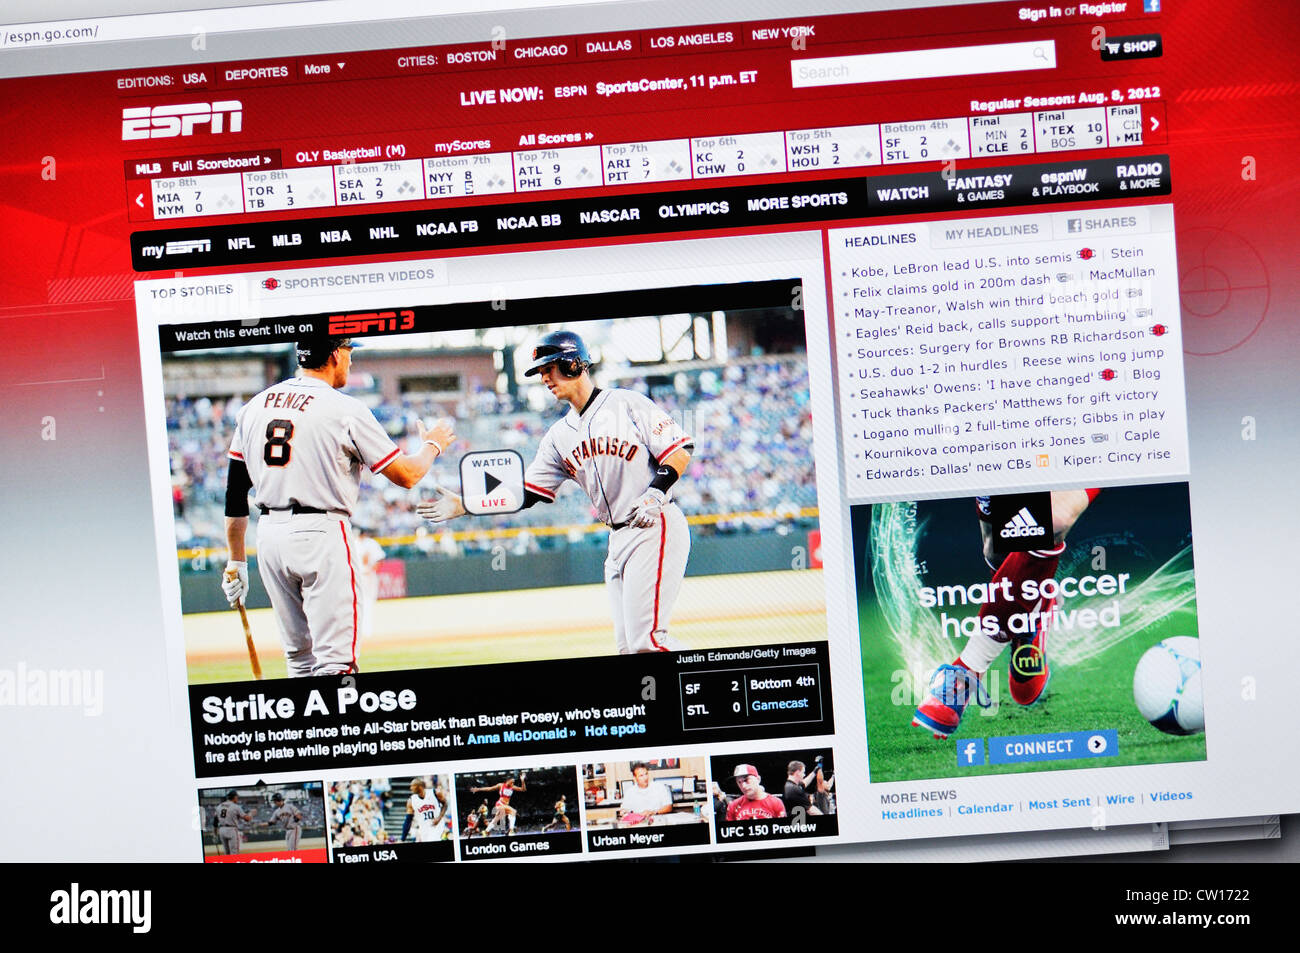 Espn Sports Channel Website Stock Photo Alamy